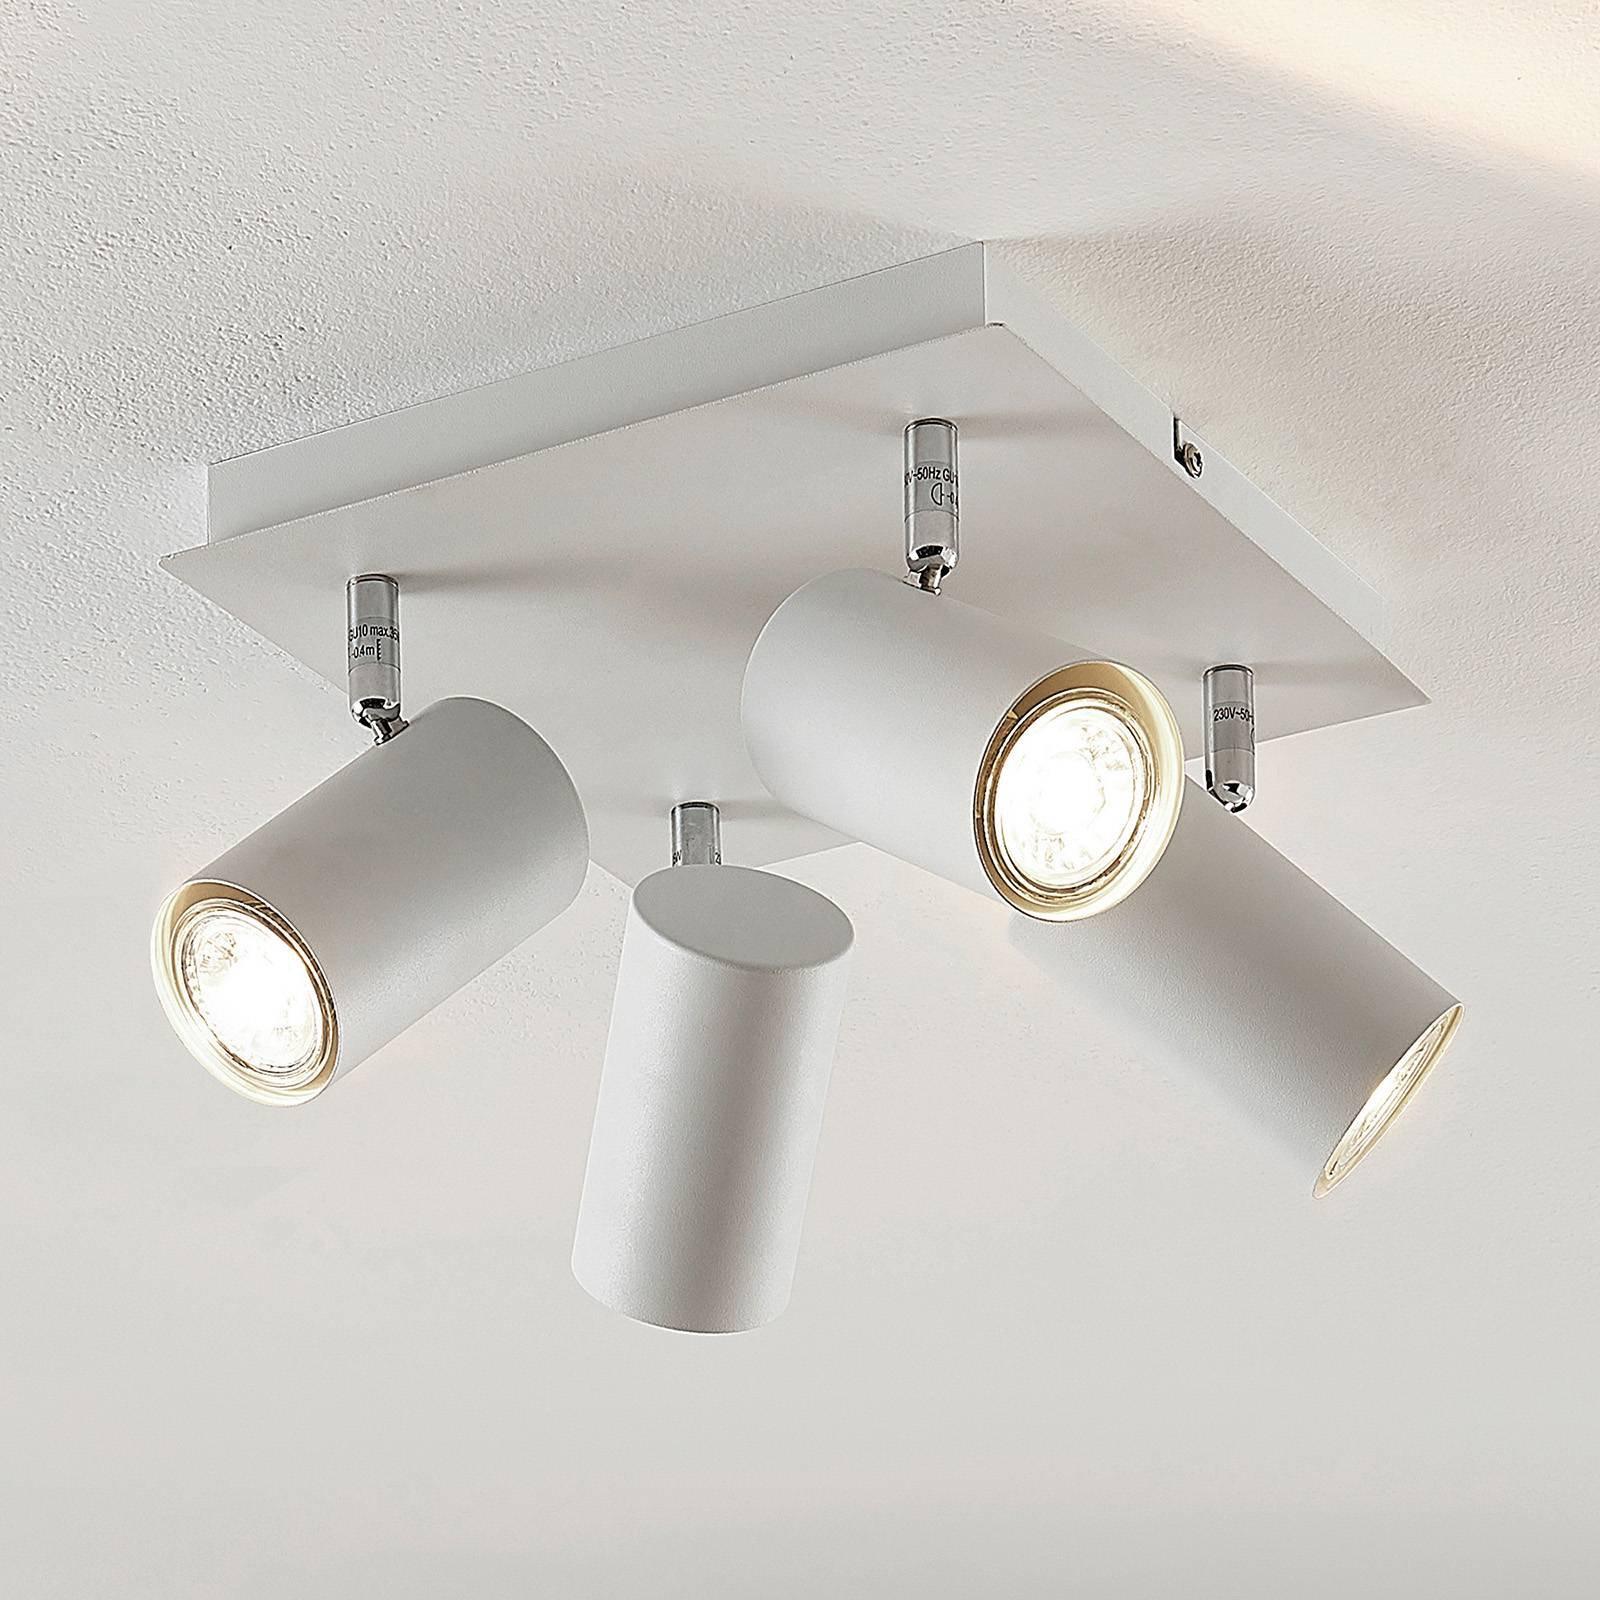 Lindby Joffrey taklampe, fire lys, hvit